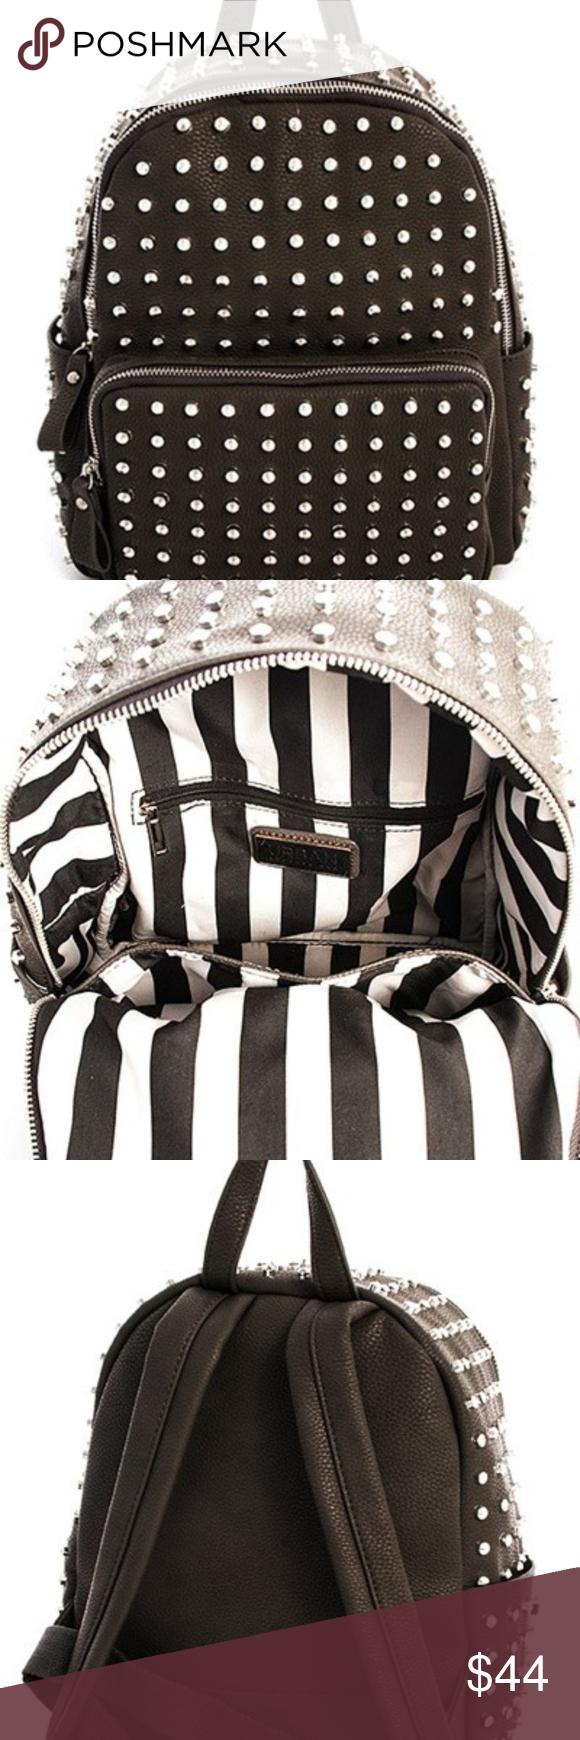 24b80f790c7 Studded Backpack Smooth Textured PU Leather Adjustable Backpack Straps  Zipper Top Closure Front Zipper Pocket Inside Zip Wall Pocket at Back Side  Inside ...